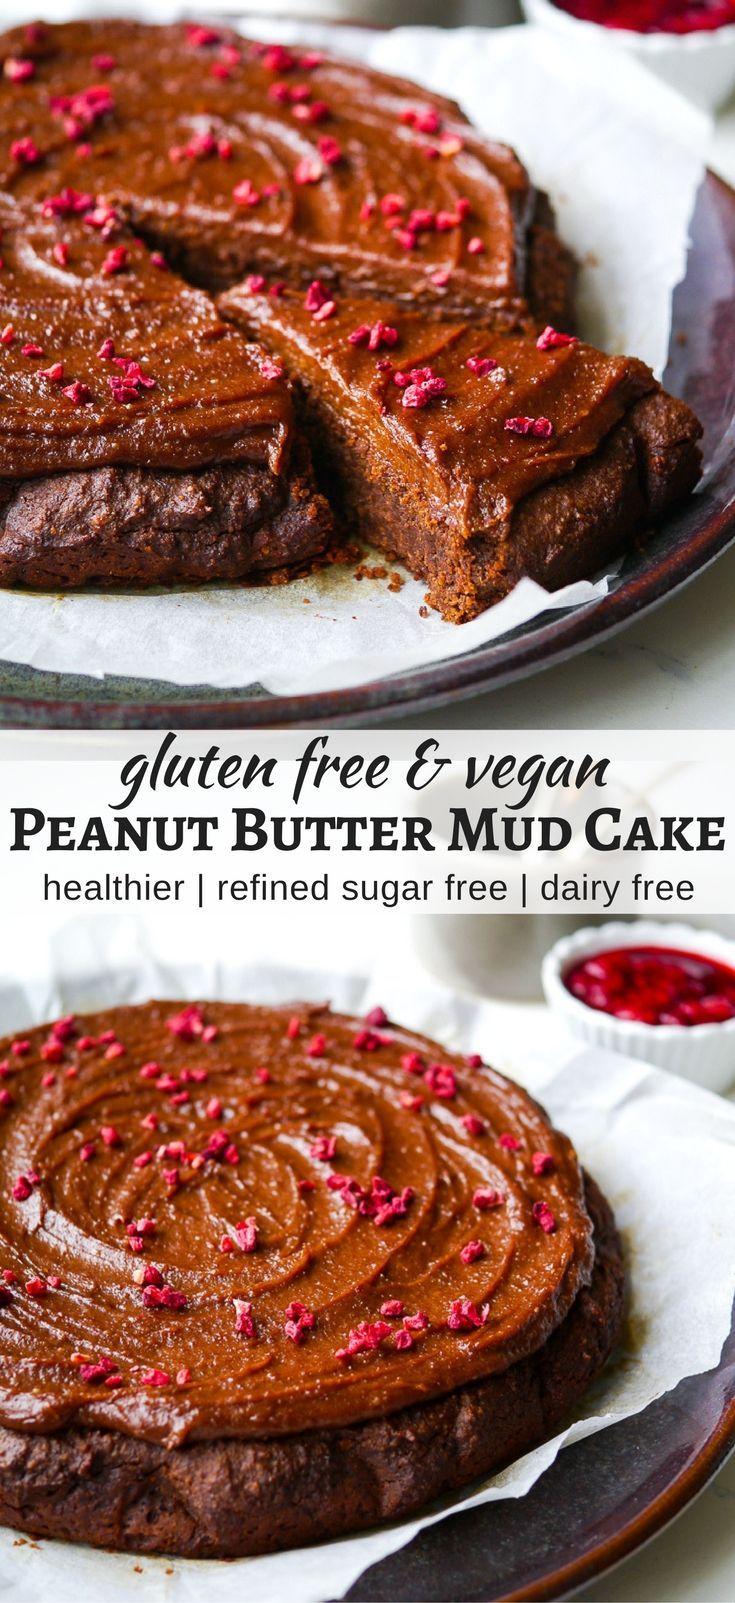 Healthy Peanut Butter Mud Cake (vegan, gluten free, grain free, dairy free, egg free) - recipe via Nourish Everyday